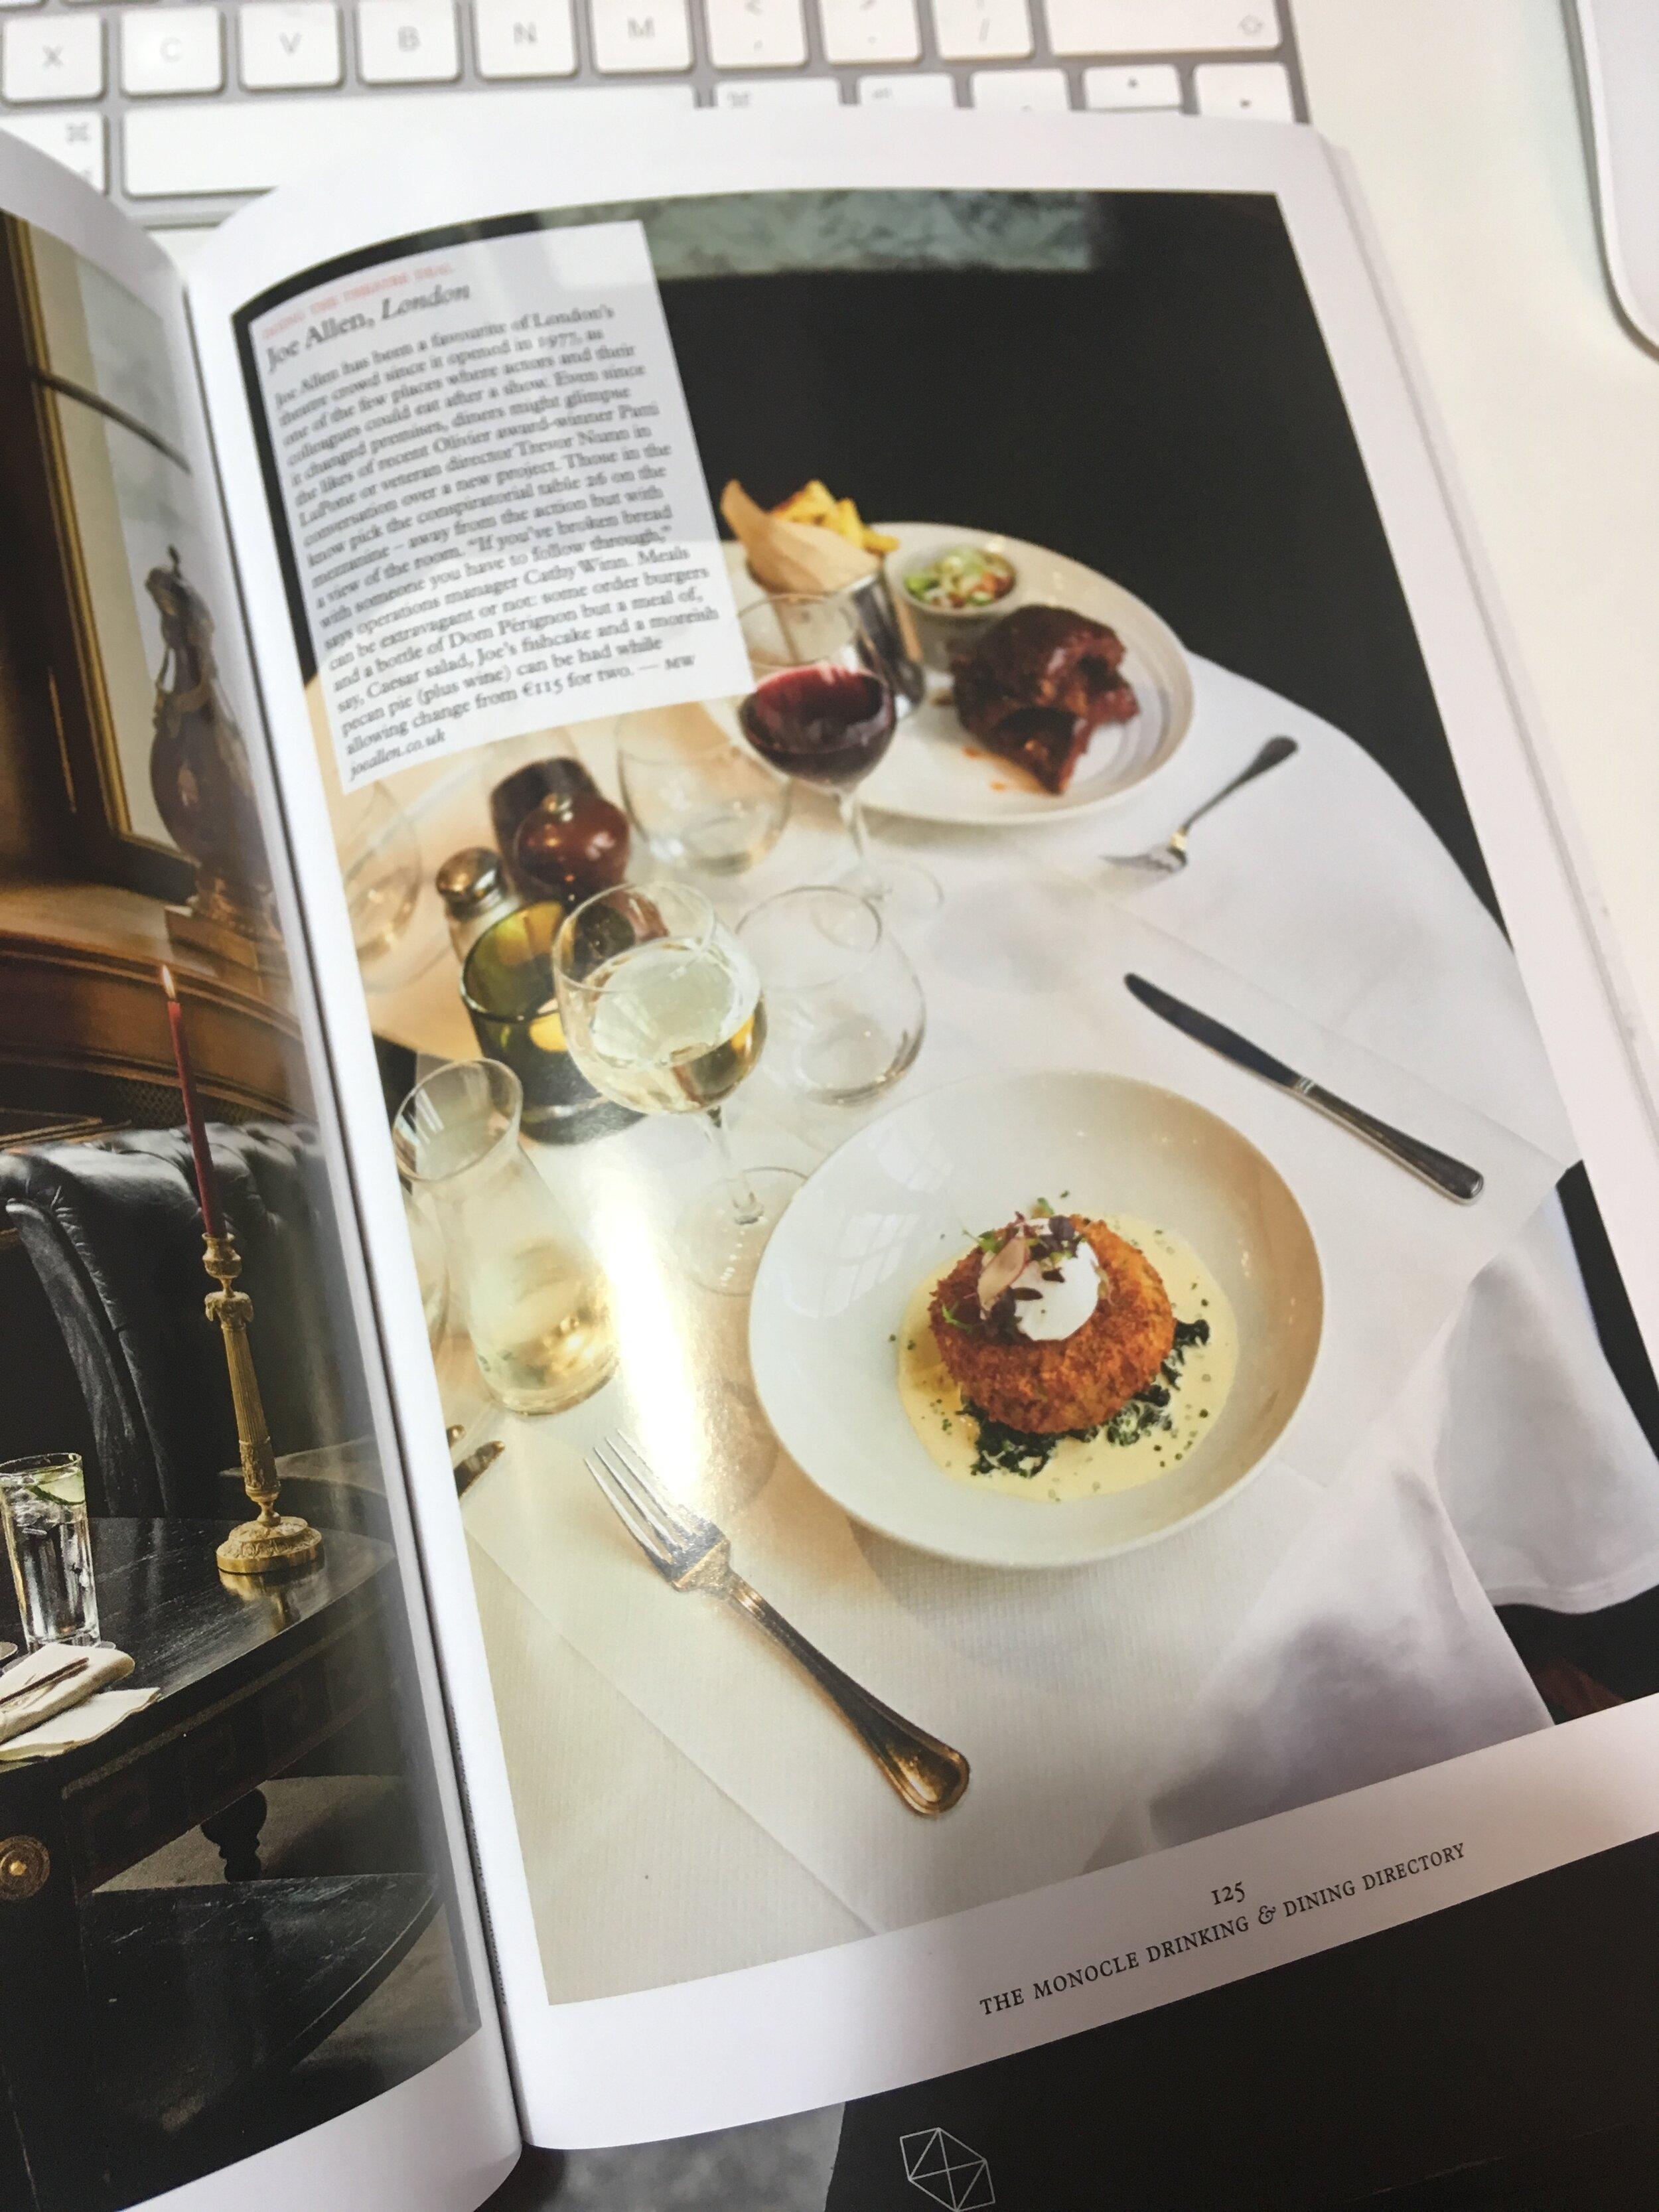 london-monocle-magazine-restaurant-dining-food-drink-guide-foodie-foodporn-realfood-joe-allens-wesrt-end-foodphotography-nick-warner-photographer-london-theatre-westend-broadway-monoclemagazine